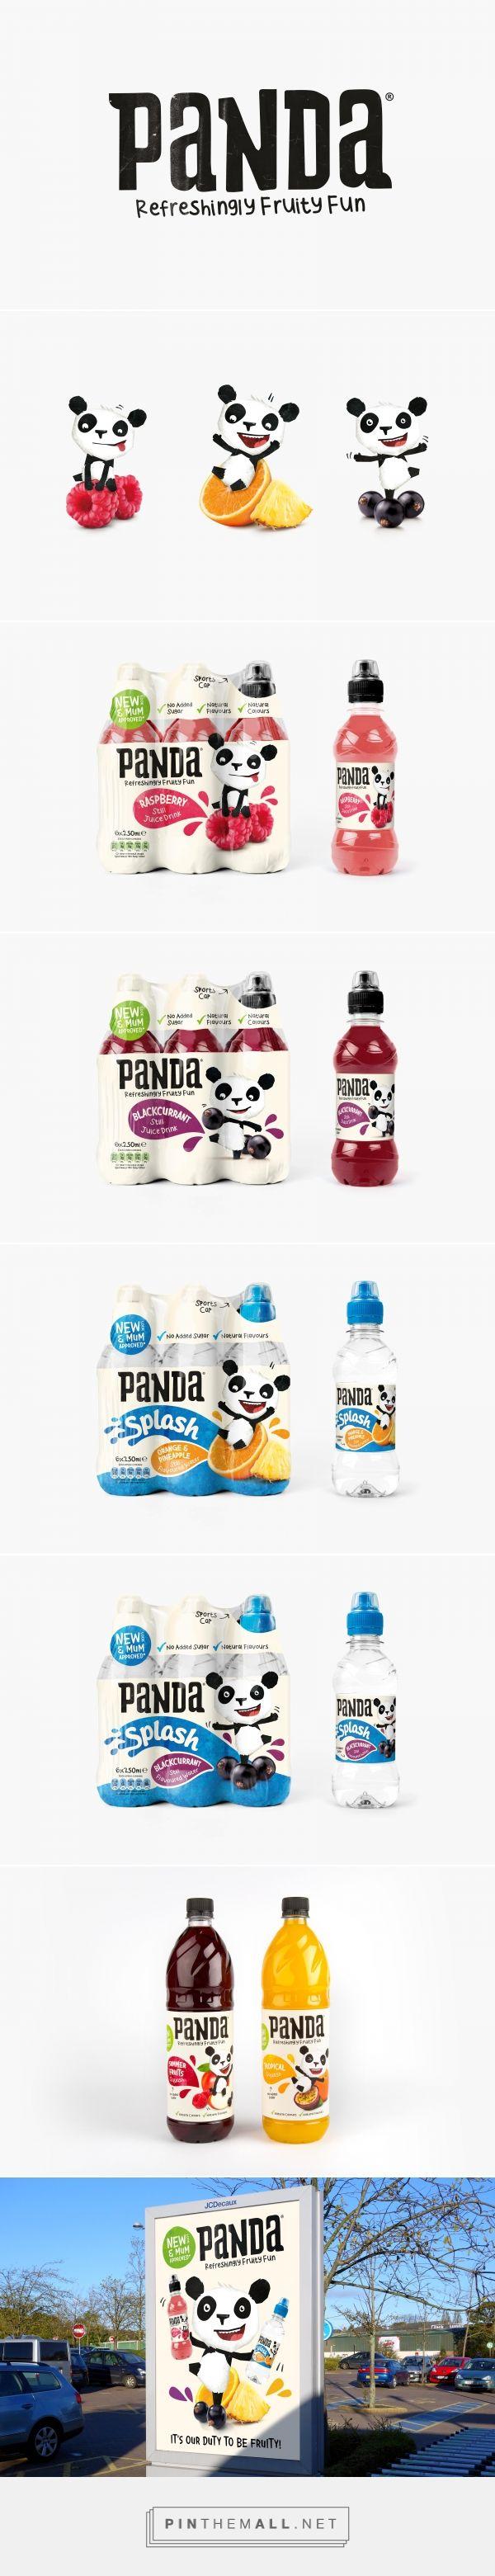 Panda | Branding & Packaging Design | Designed by Robot Food | www.robot-food.com